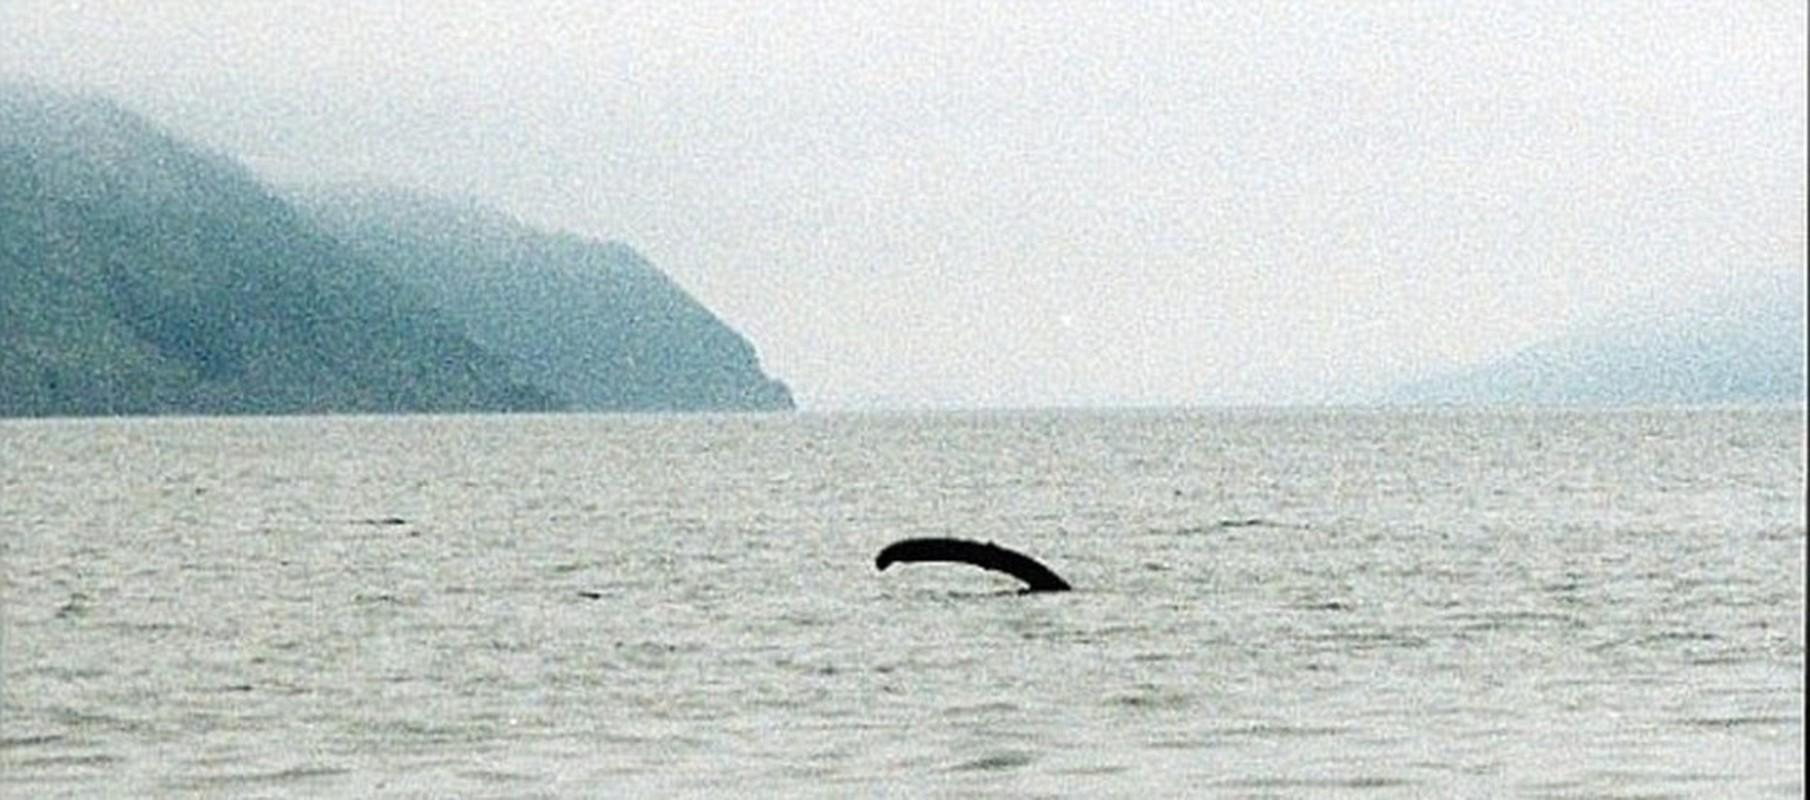 Cuc nong: Su that ve quai vat ho Loch Ness da duoc phoi bay?-Hinh-5